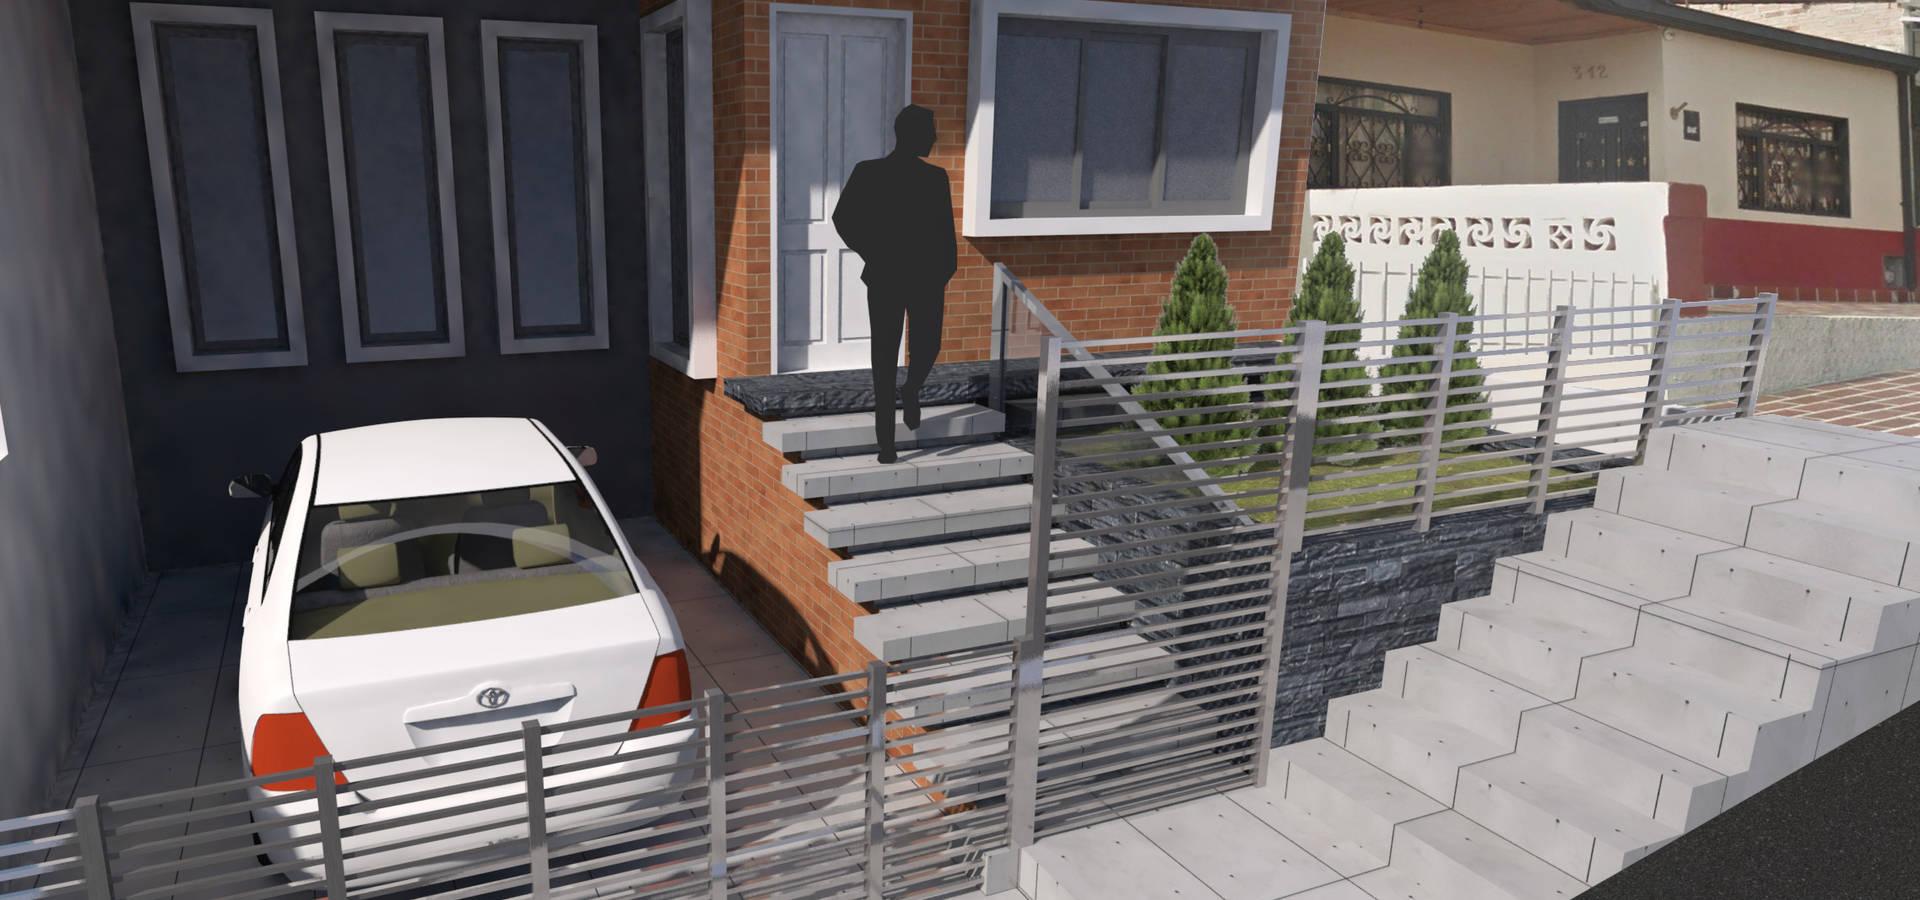 Arquitecto Harvin Sanchez Areniz